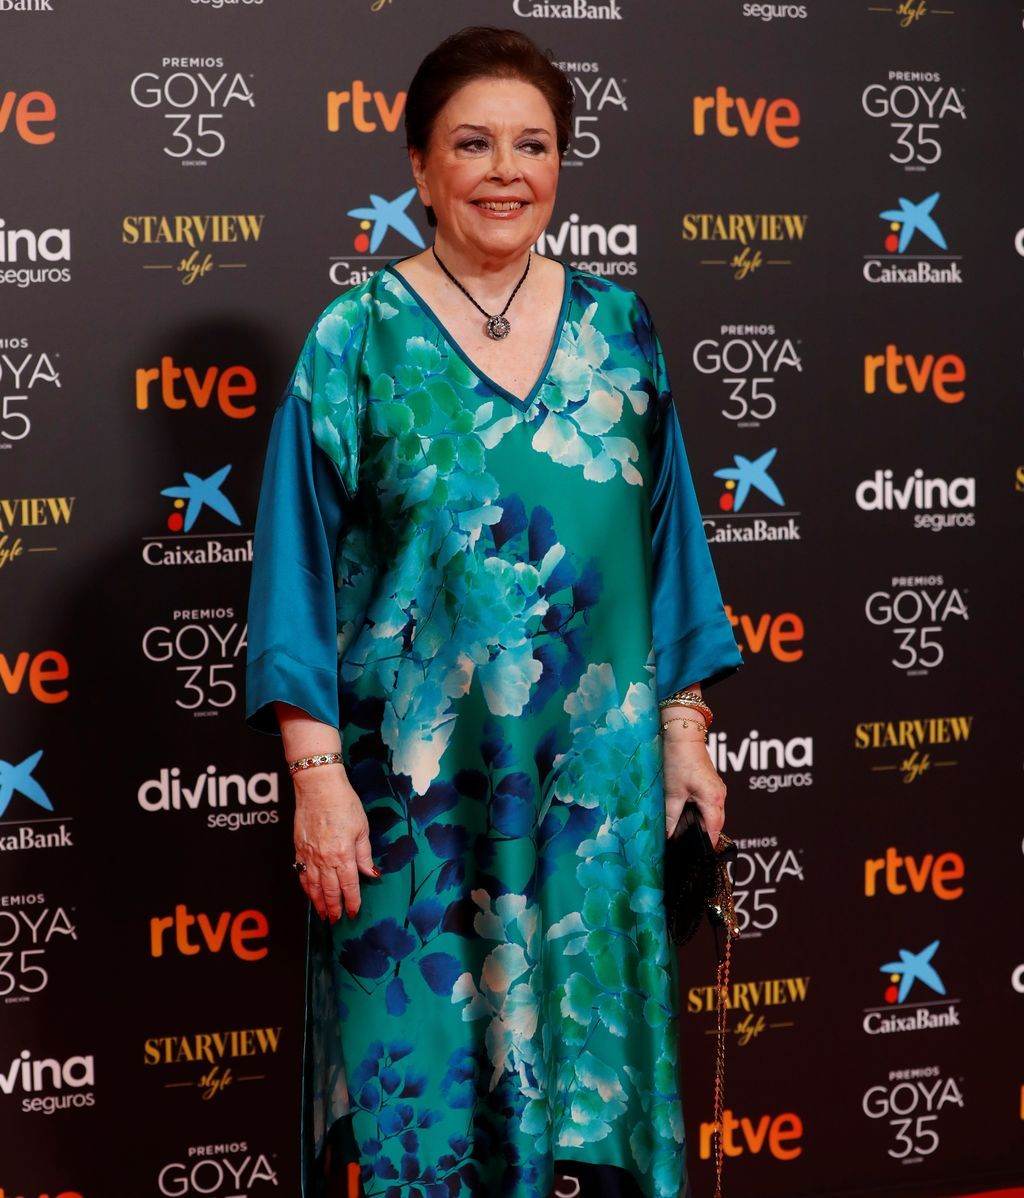 Mónica Randall en la alfombra roja de los Premios Goya 2021